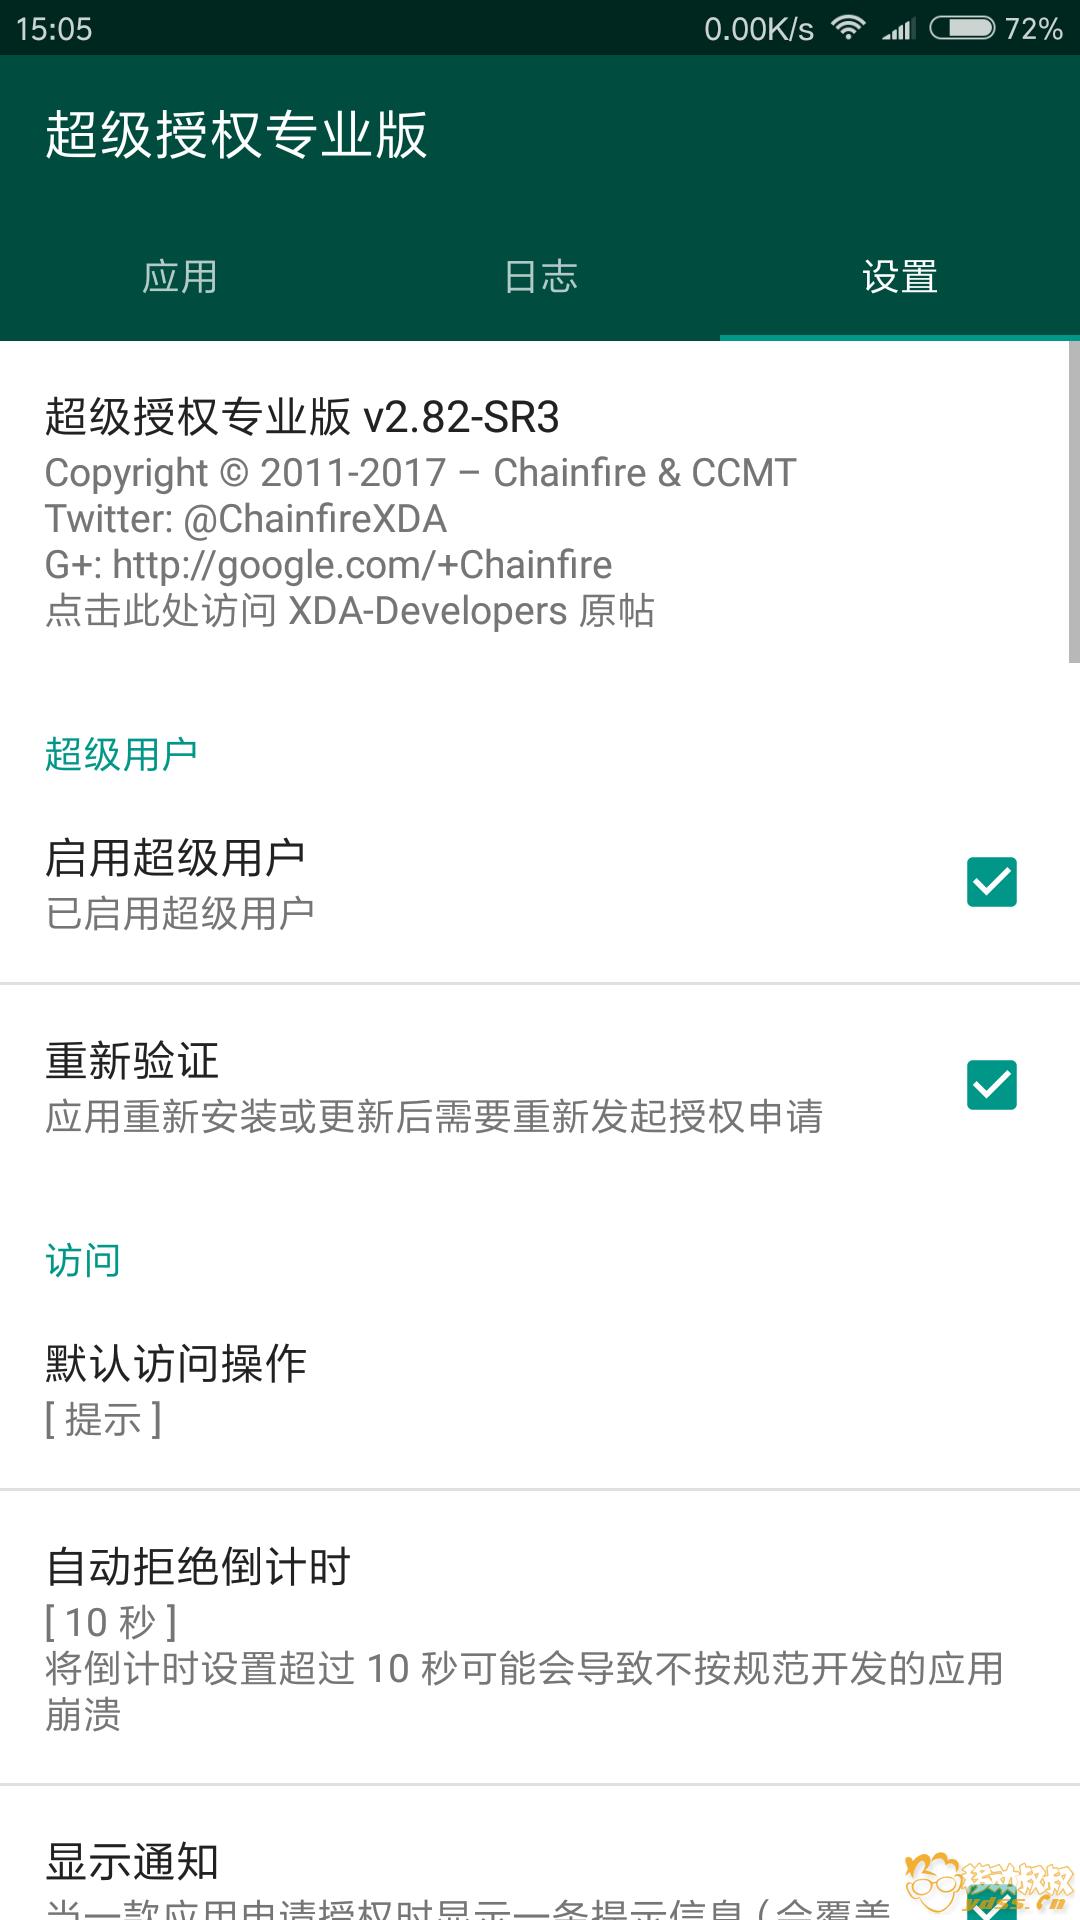 Screenshot_2017-12-30-15-05-37-542_eu.chainfire.supersu.png